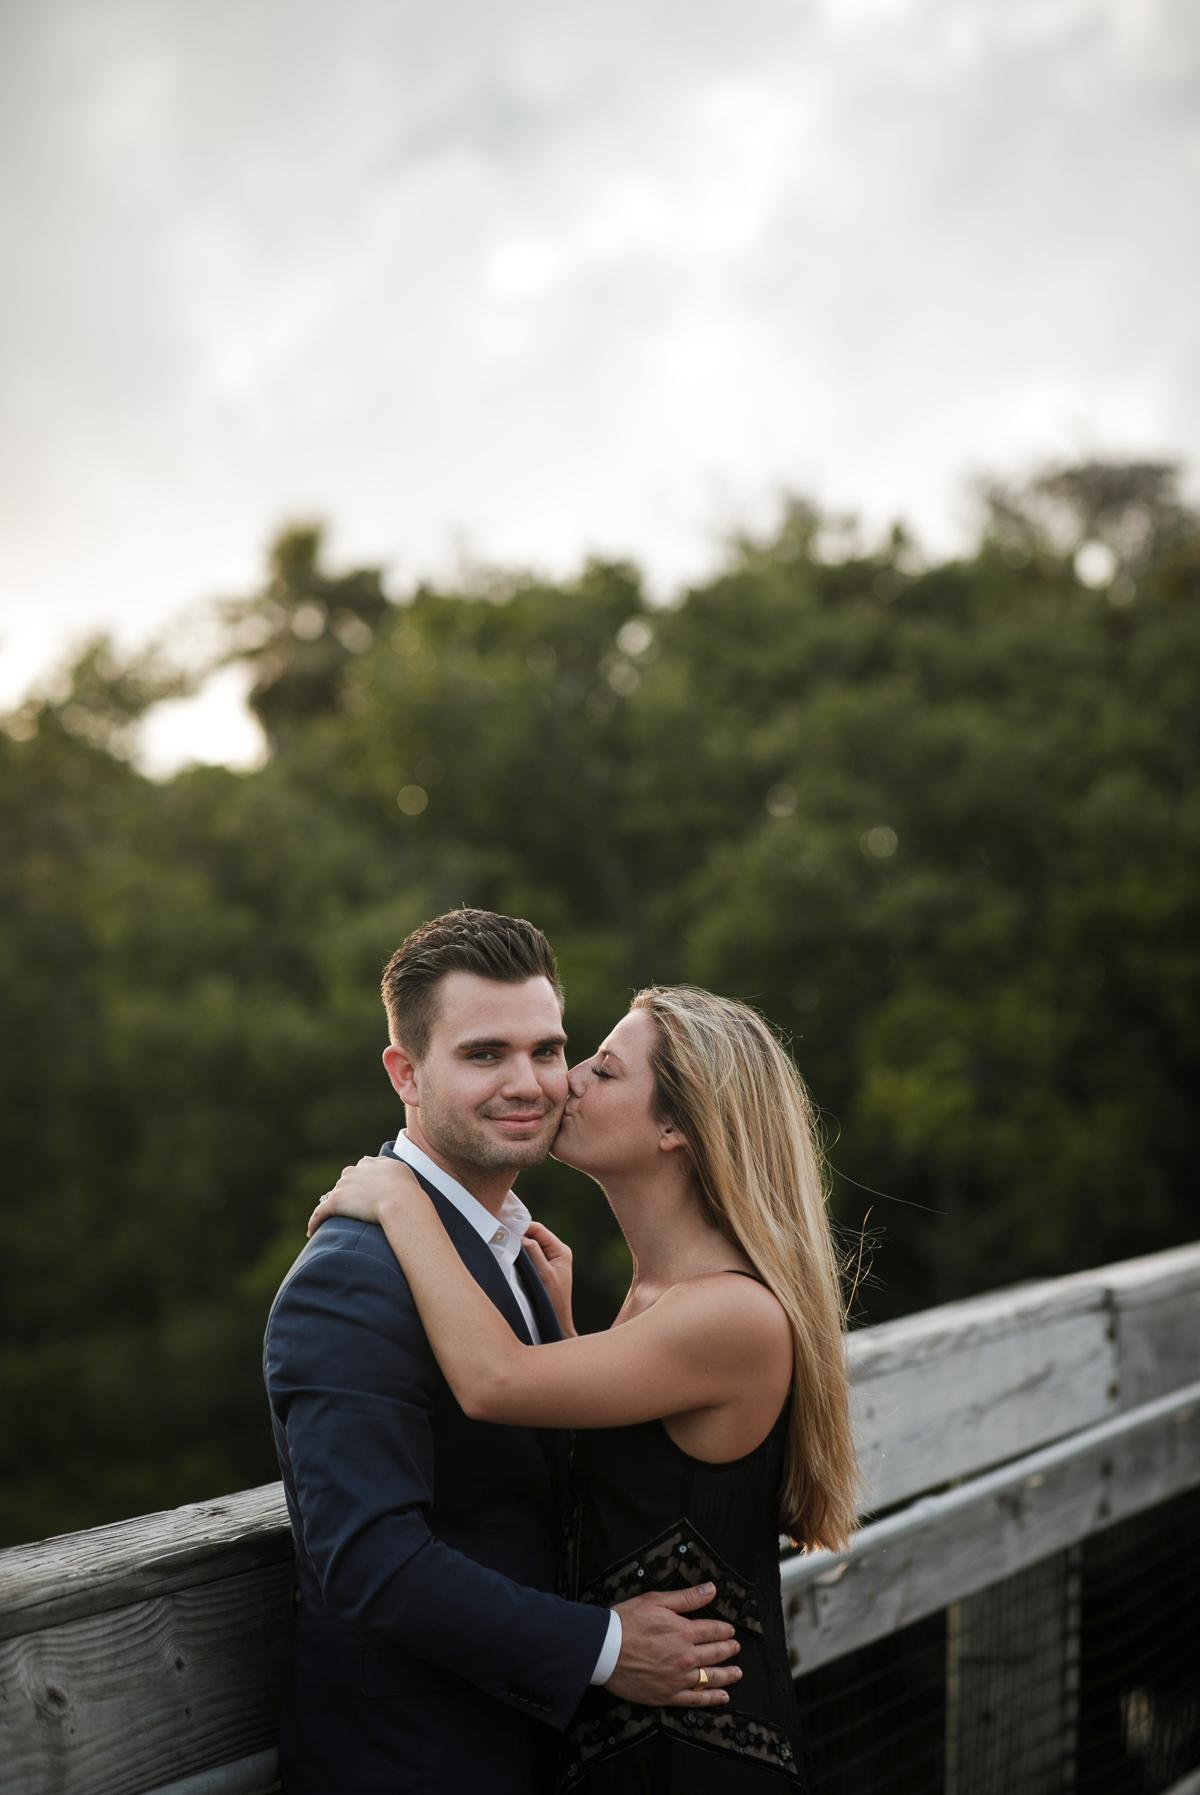 Florida-engagement-photographer-weddings